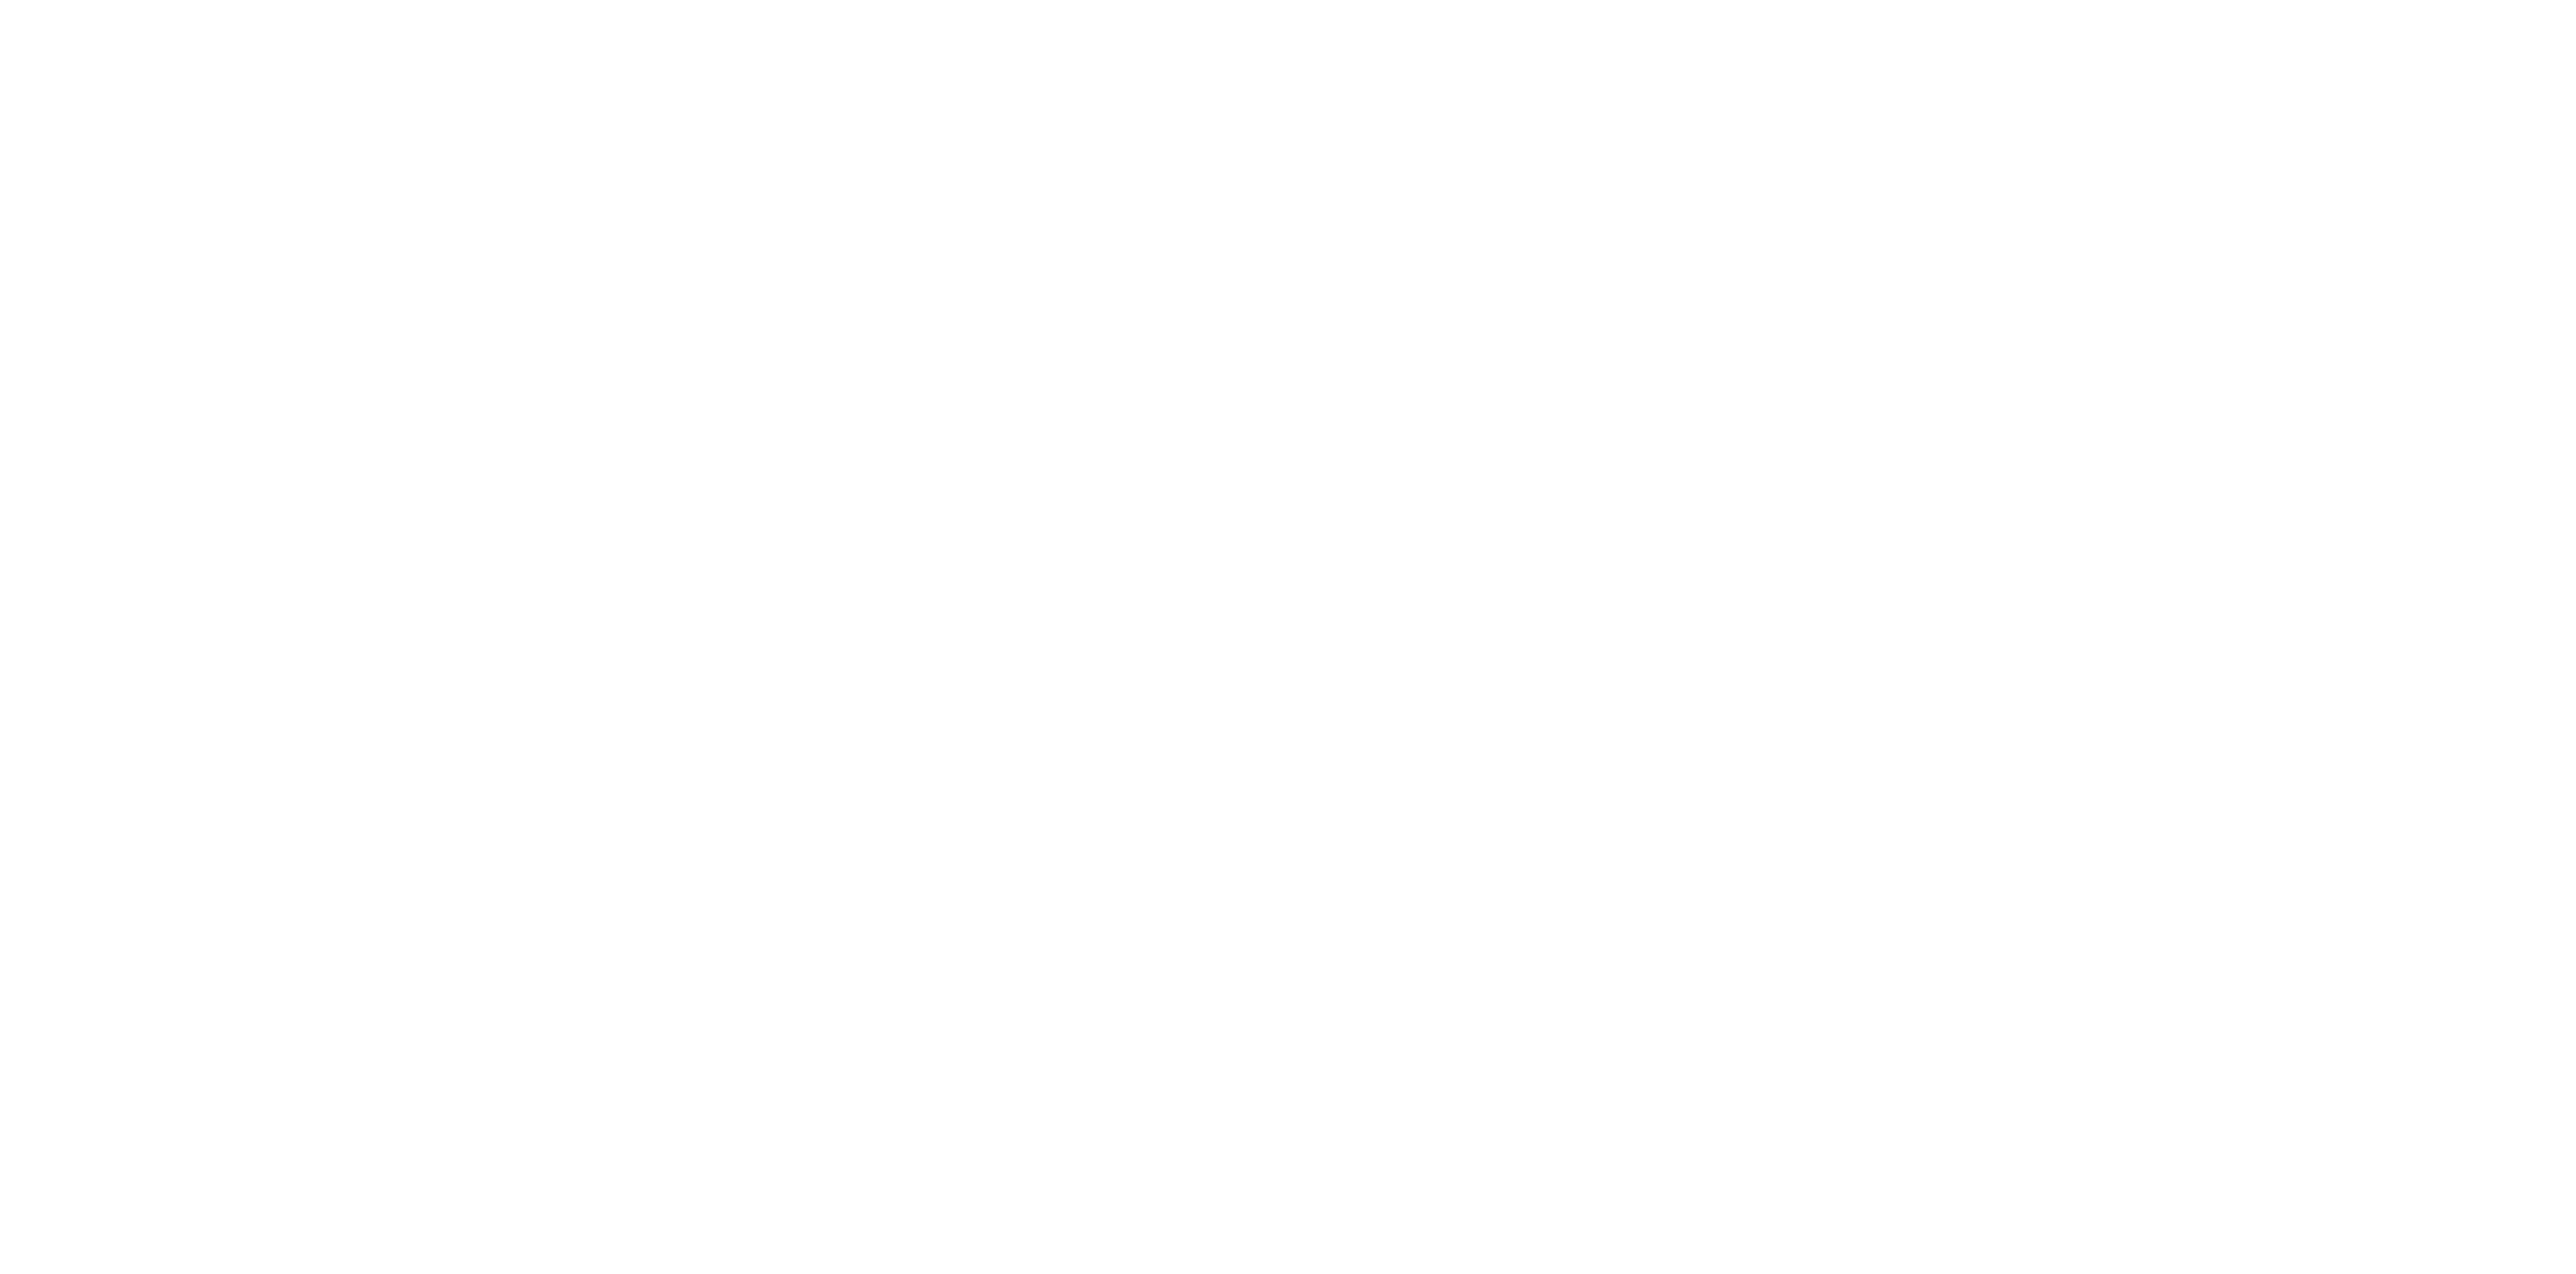 https://wwwi.globalpiyasa.com/lib/logo/44037/7d2a5772ff294389ceec41bdf72ea7dc.png